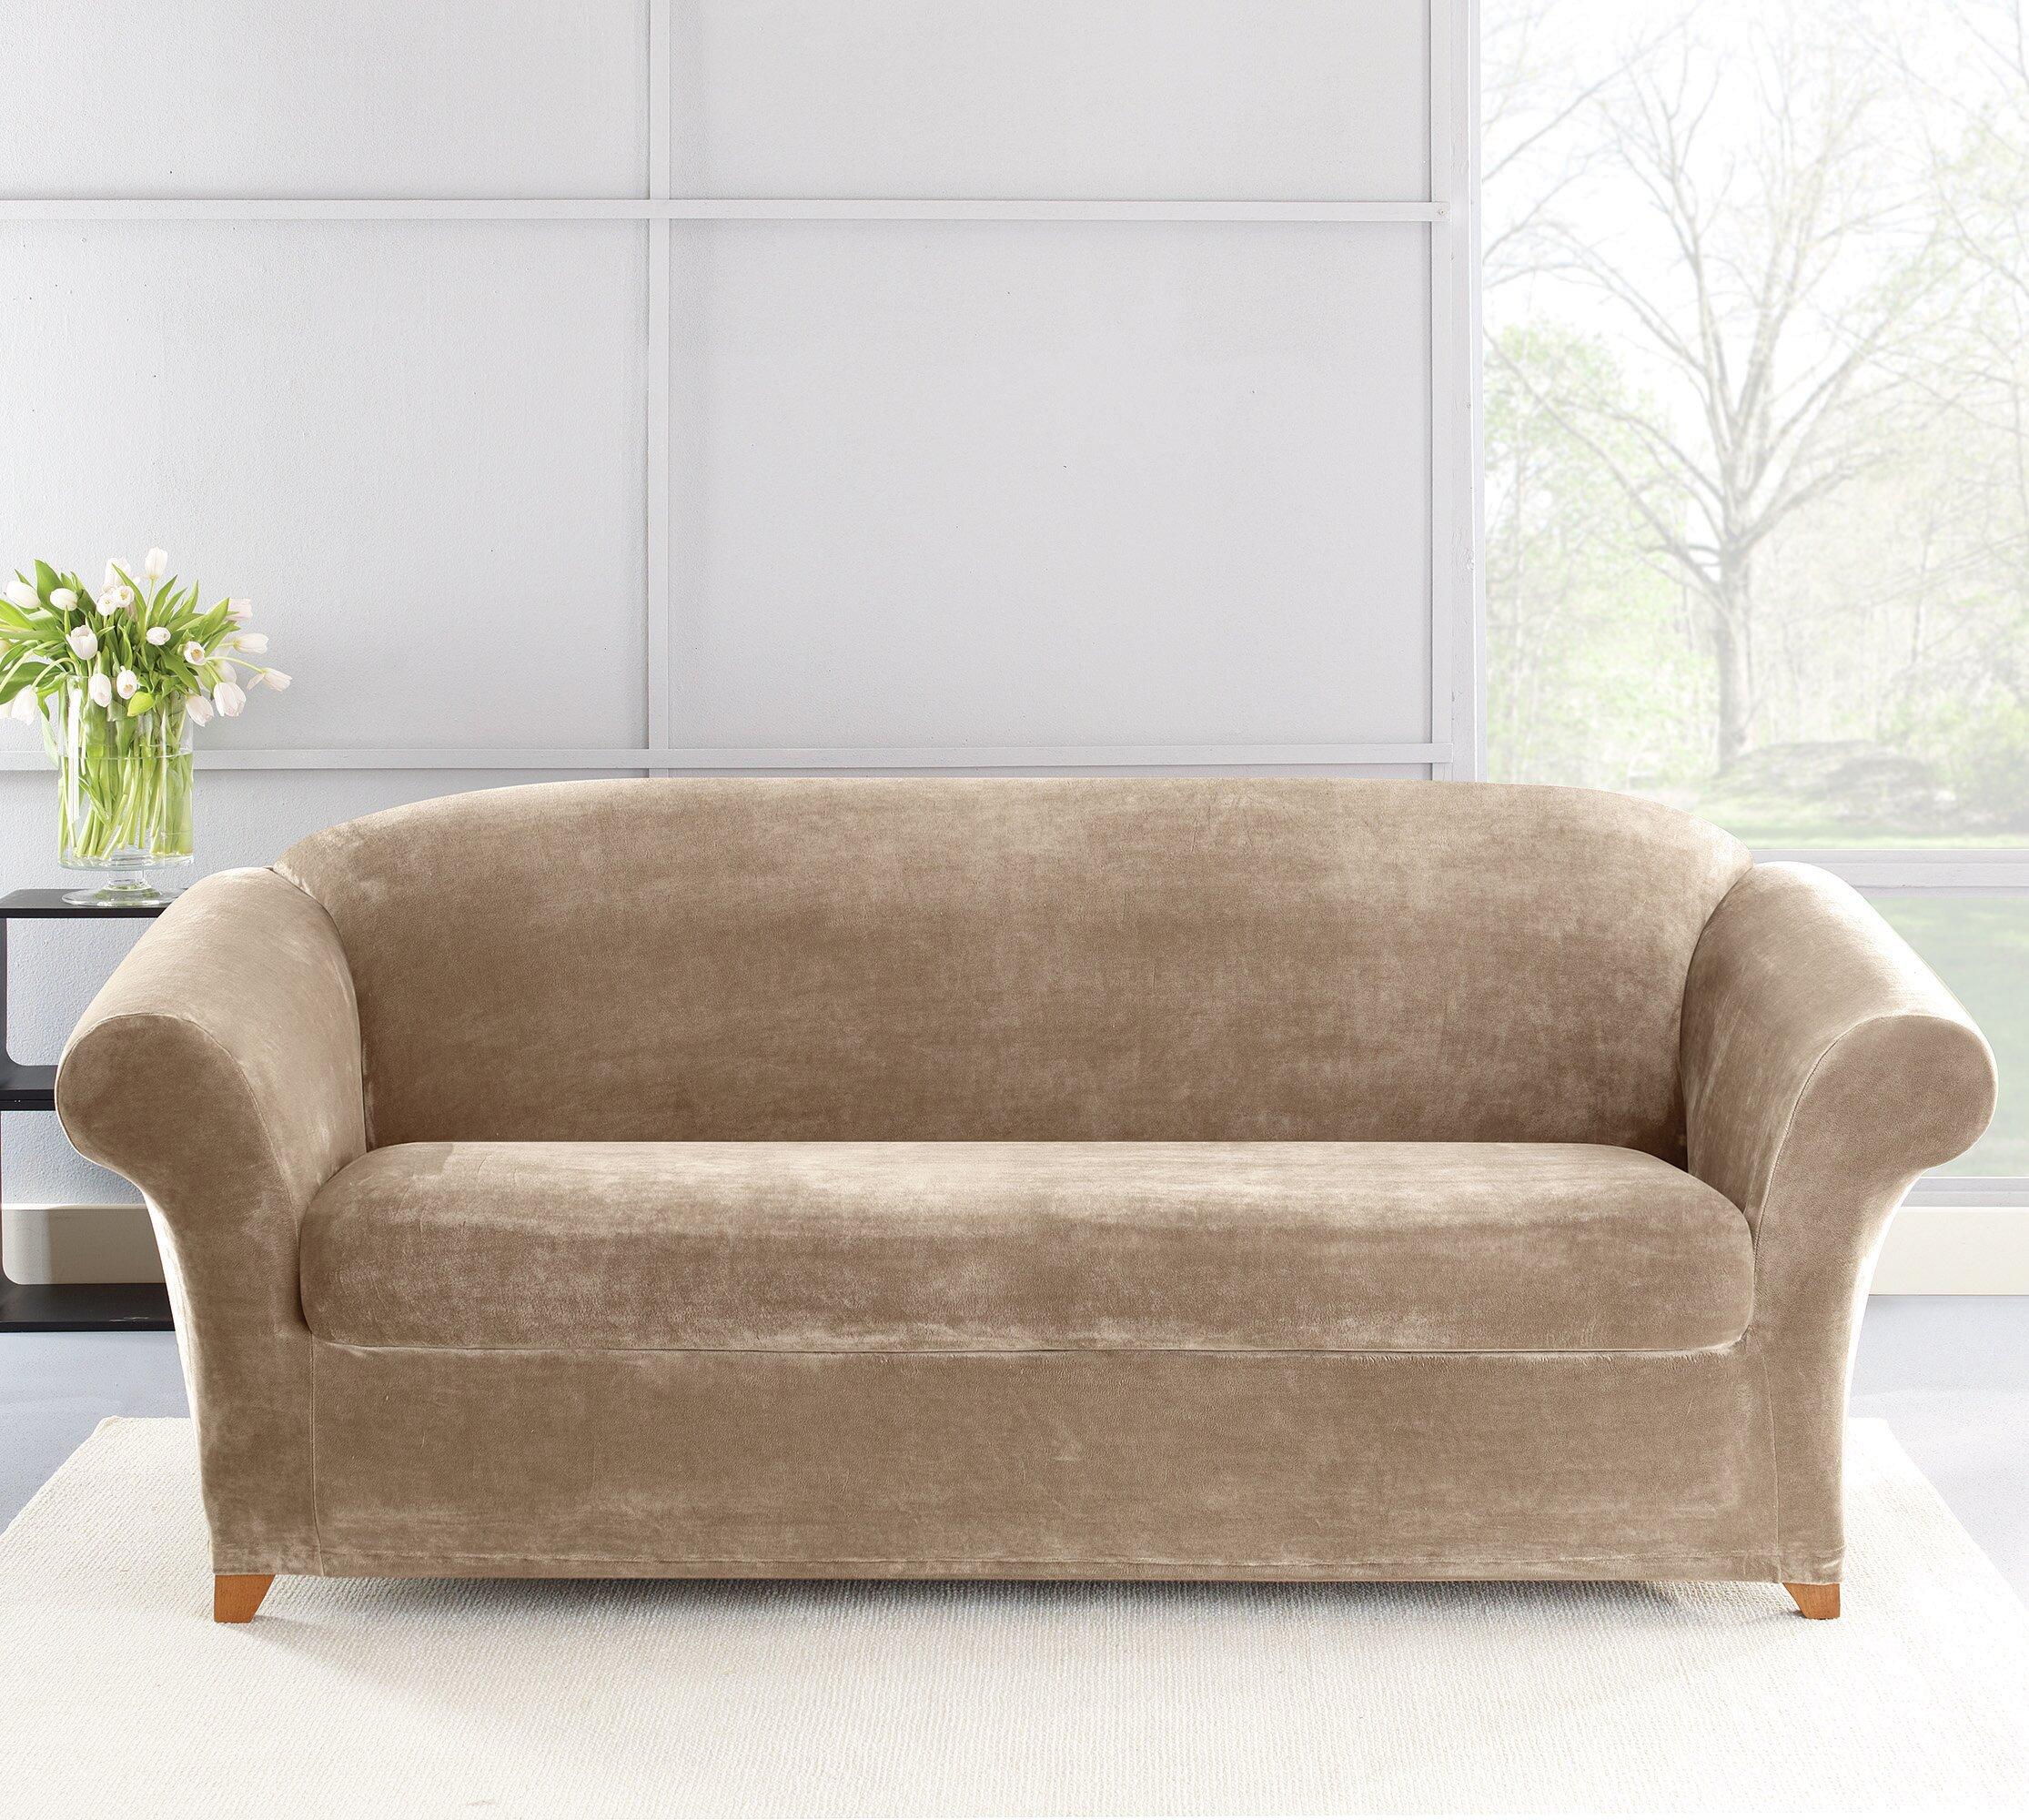 Peachy Stretch Plush 2 Piece Sofa Slipcover Set Beatyapartments Chair Design Images Beatyapartmentscom